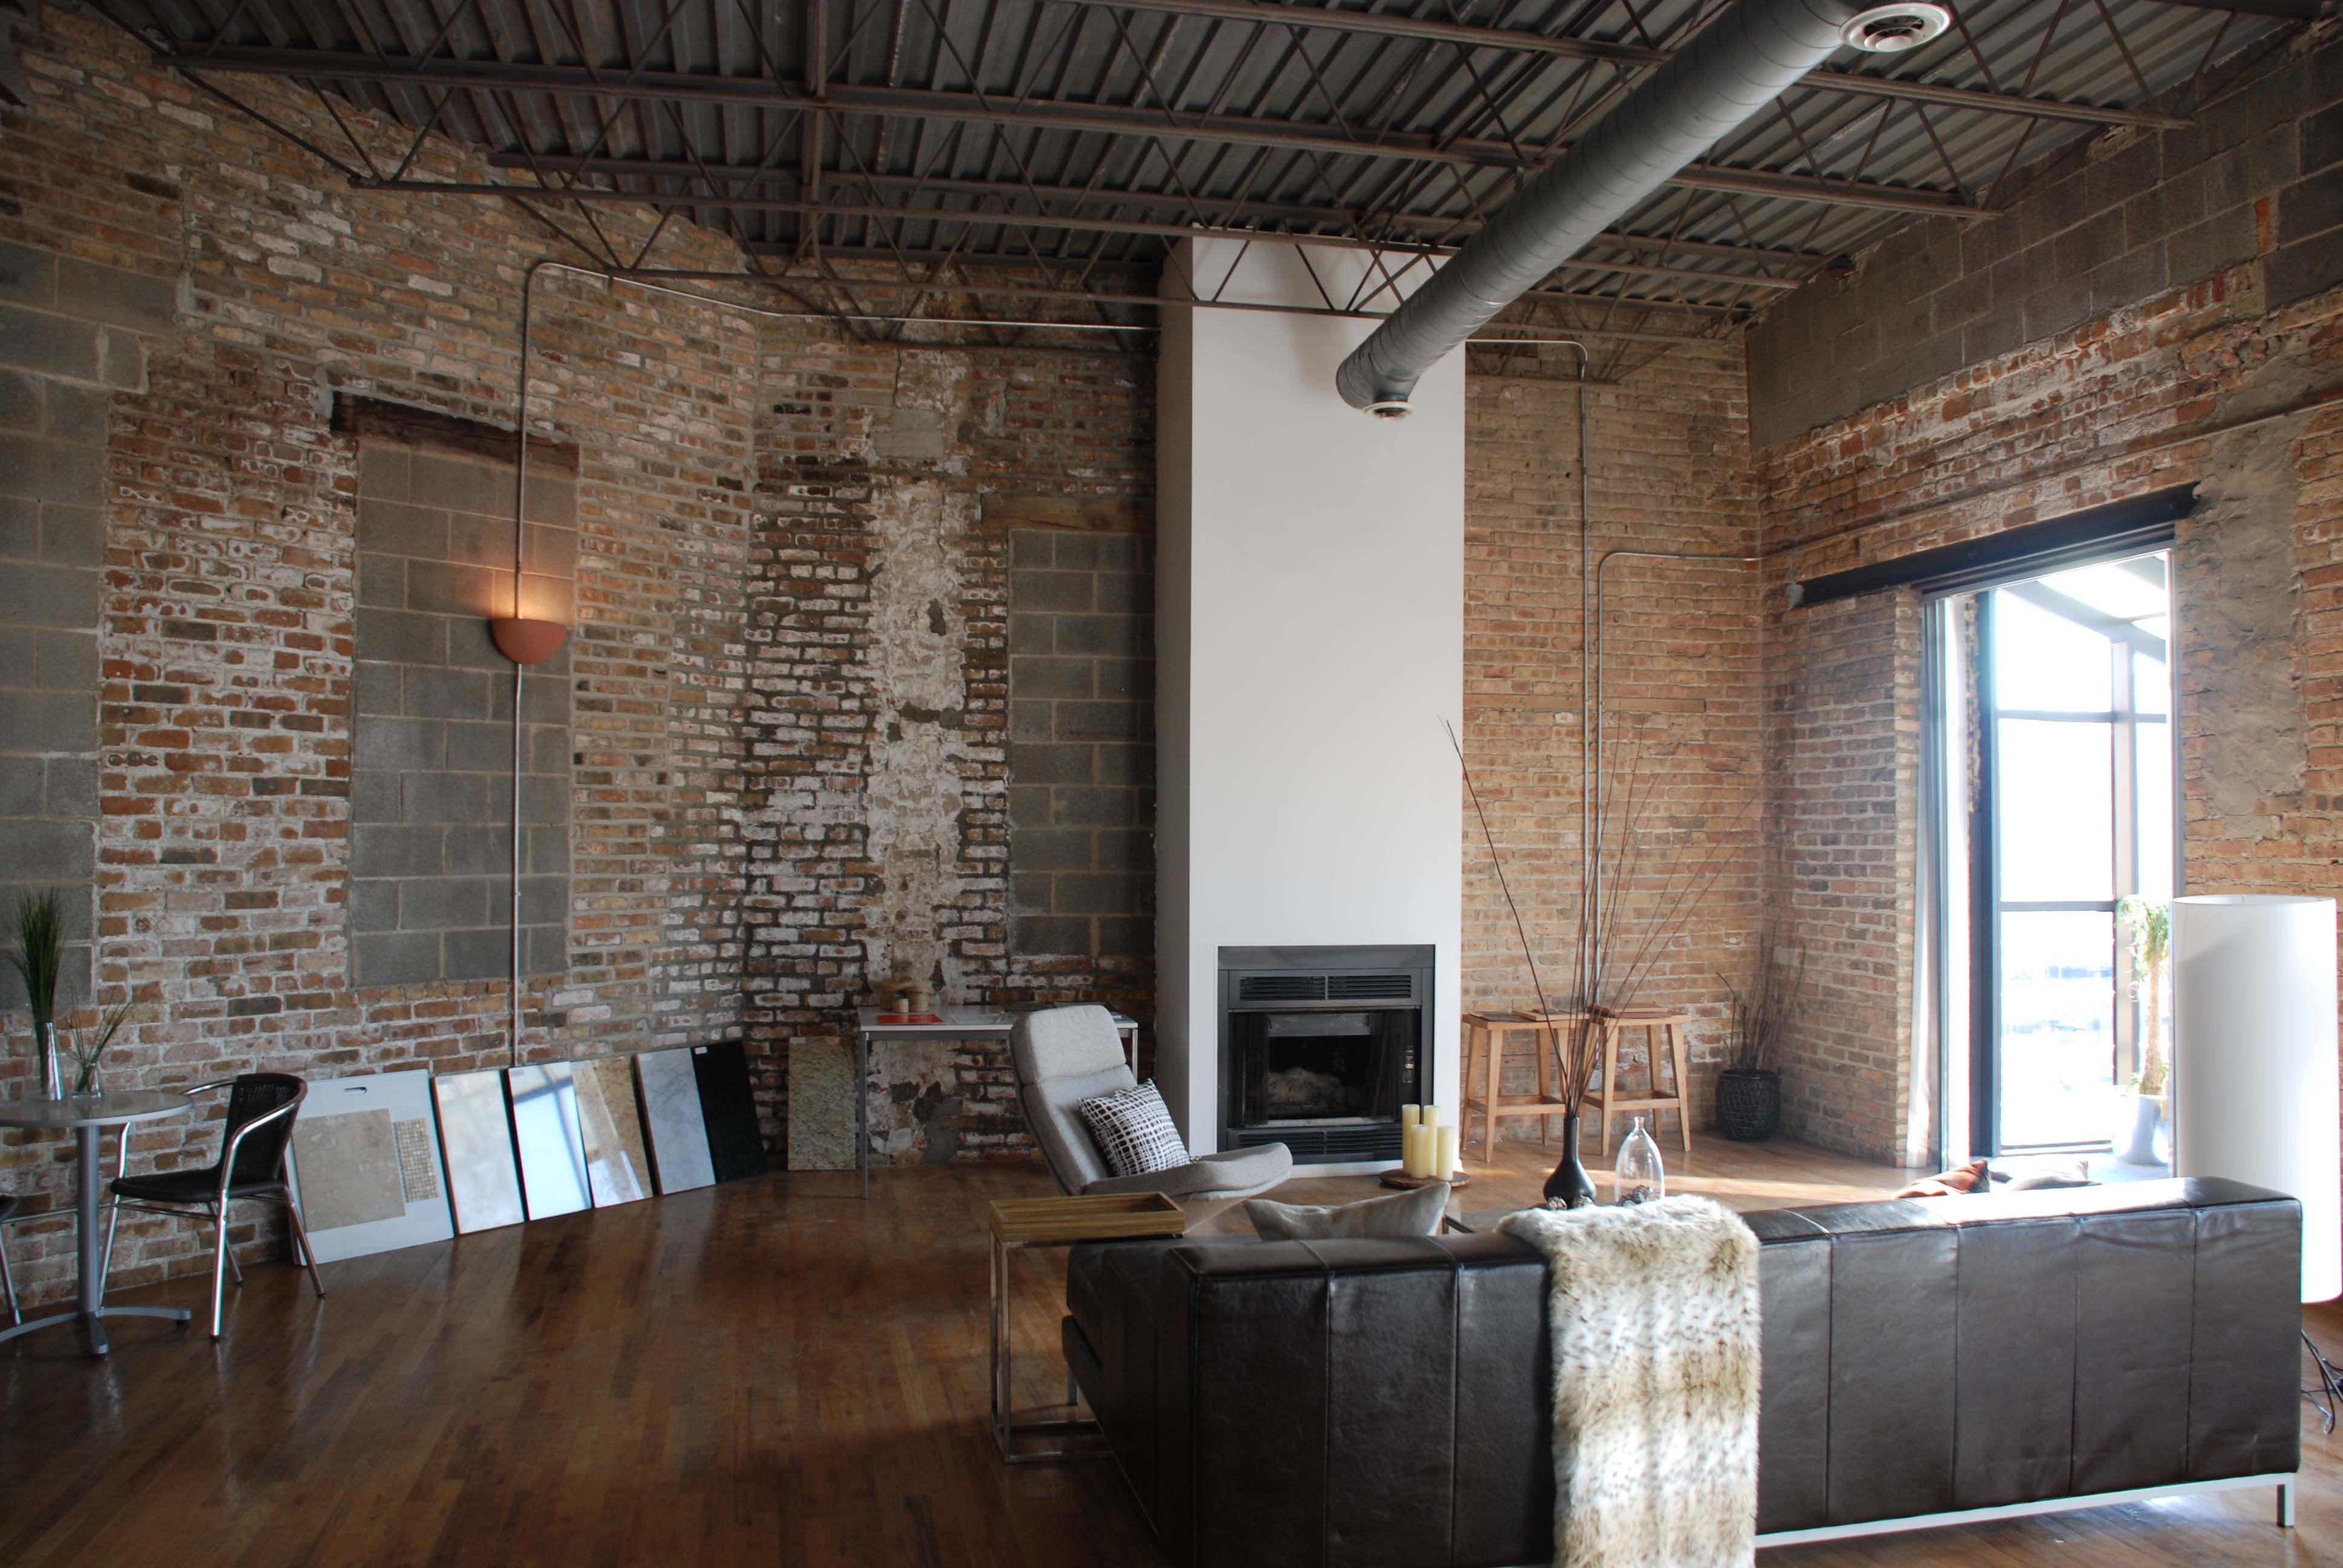 Industrial Loft Apartment On Pinterest